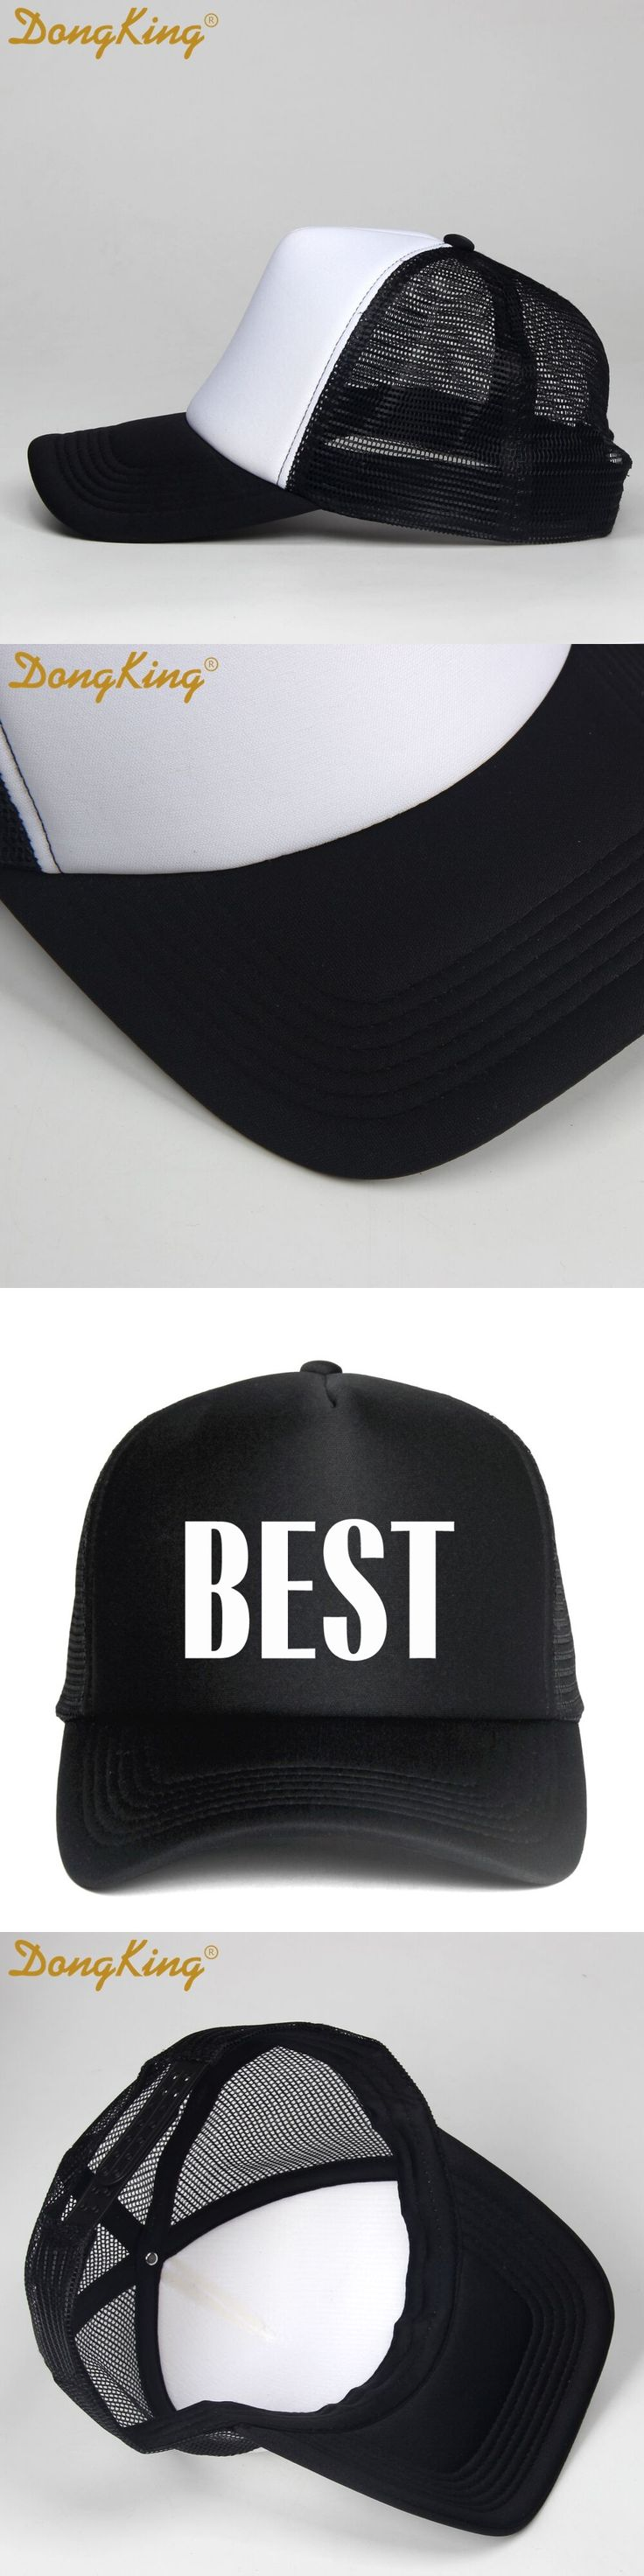 DongKing Brand Fashion Best Friend Hats Mesh Couple Hats Unisex Baseball cap Trucker Best Friend Gift